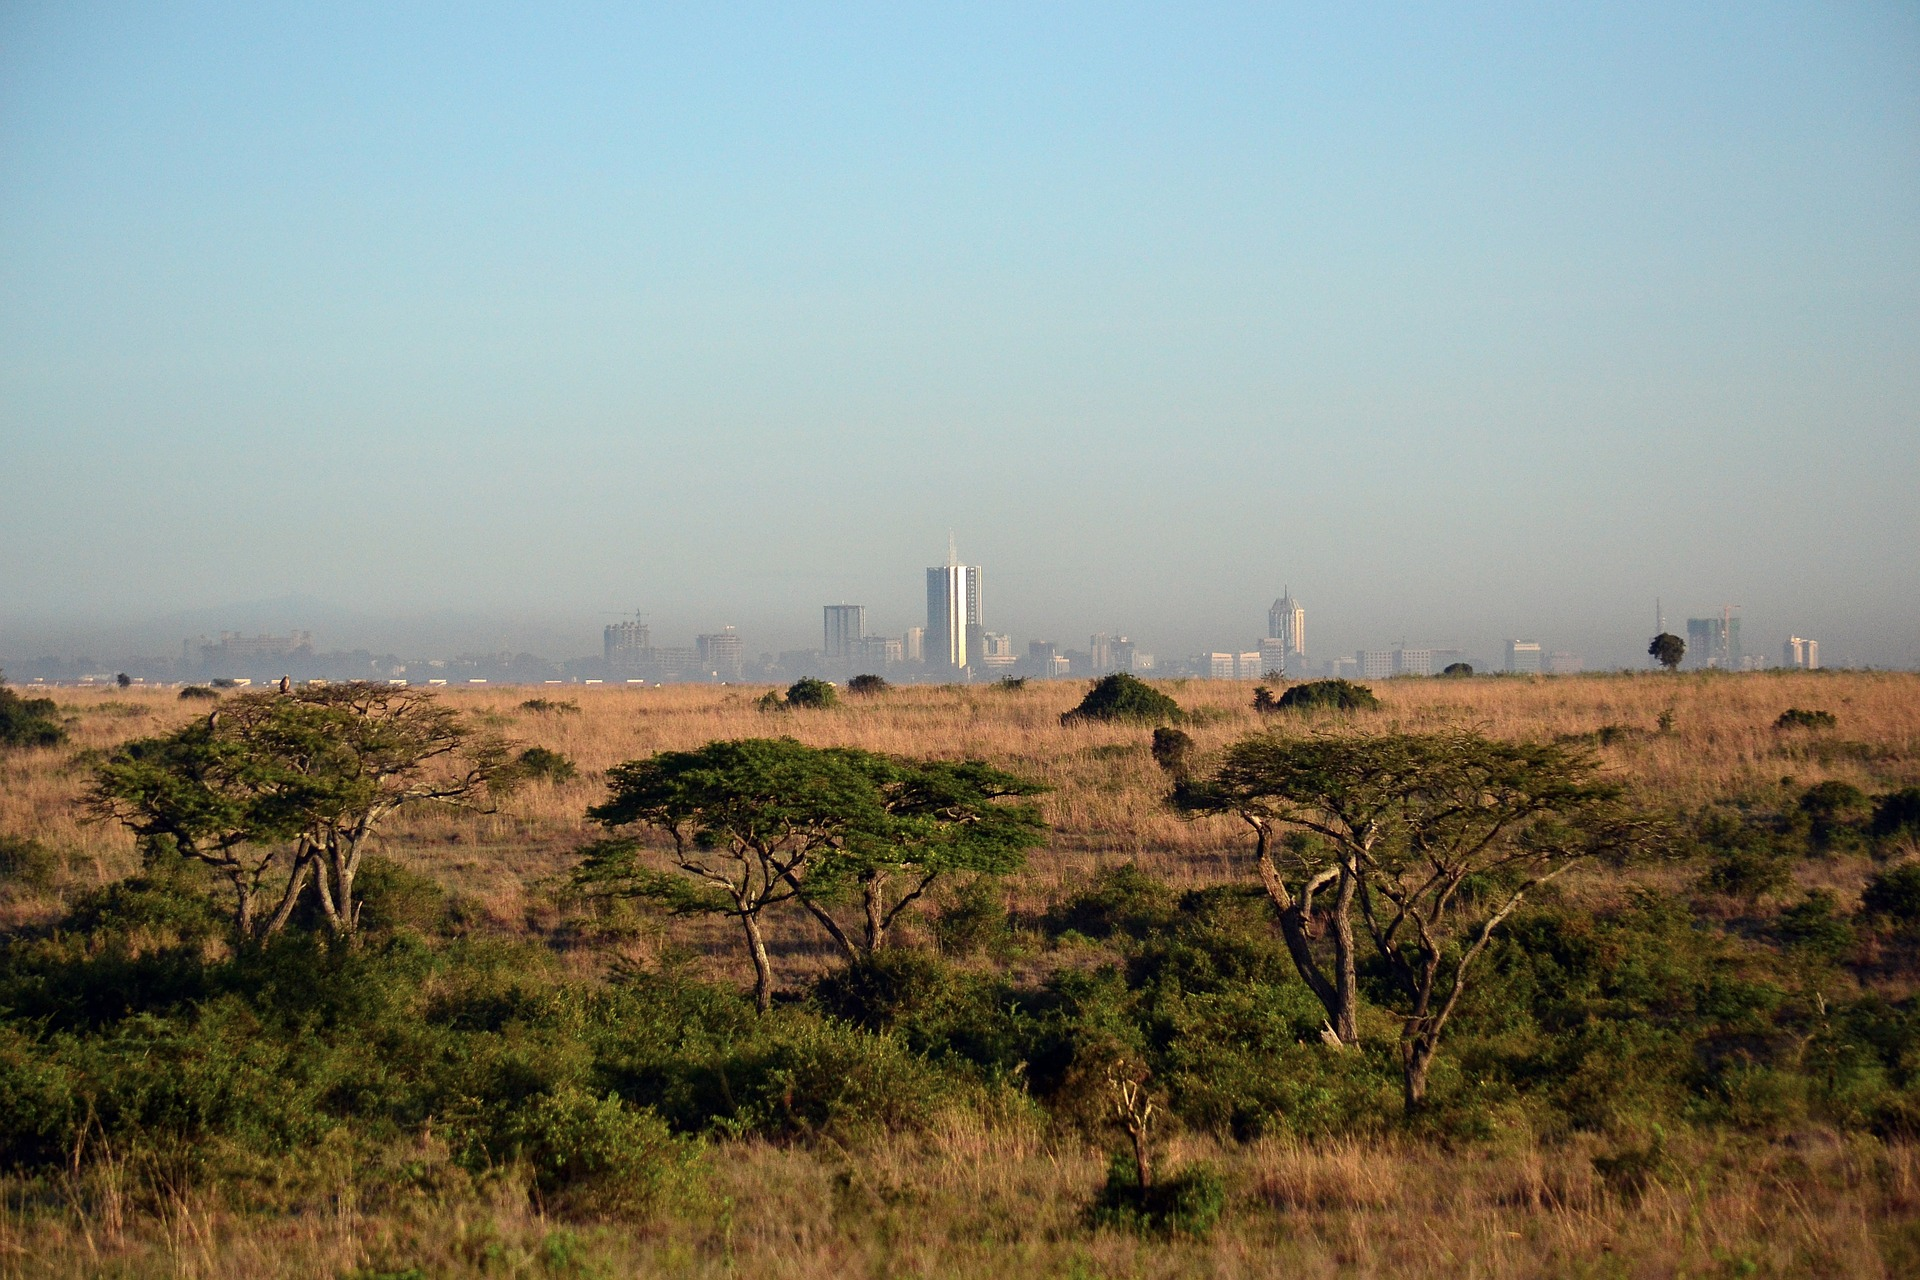 Pixabay – Nairobi